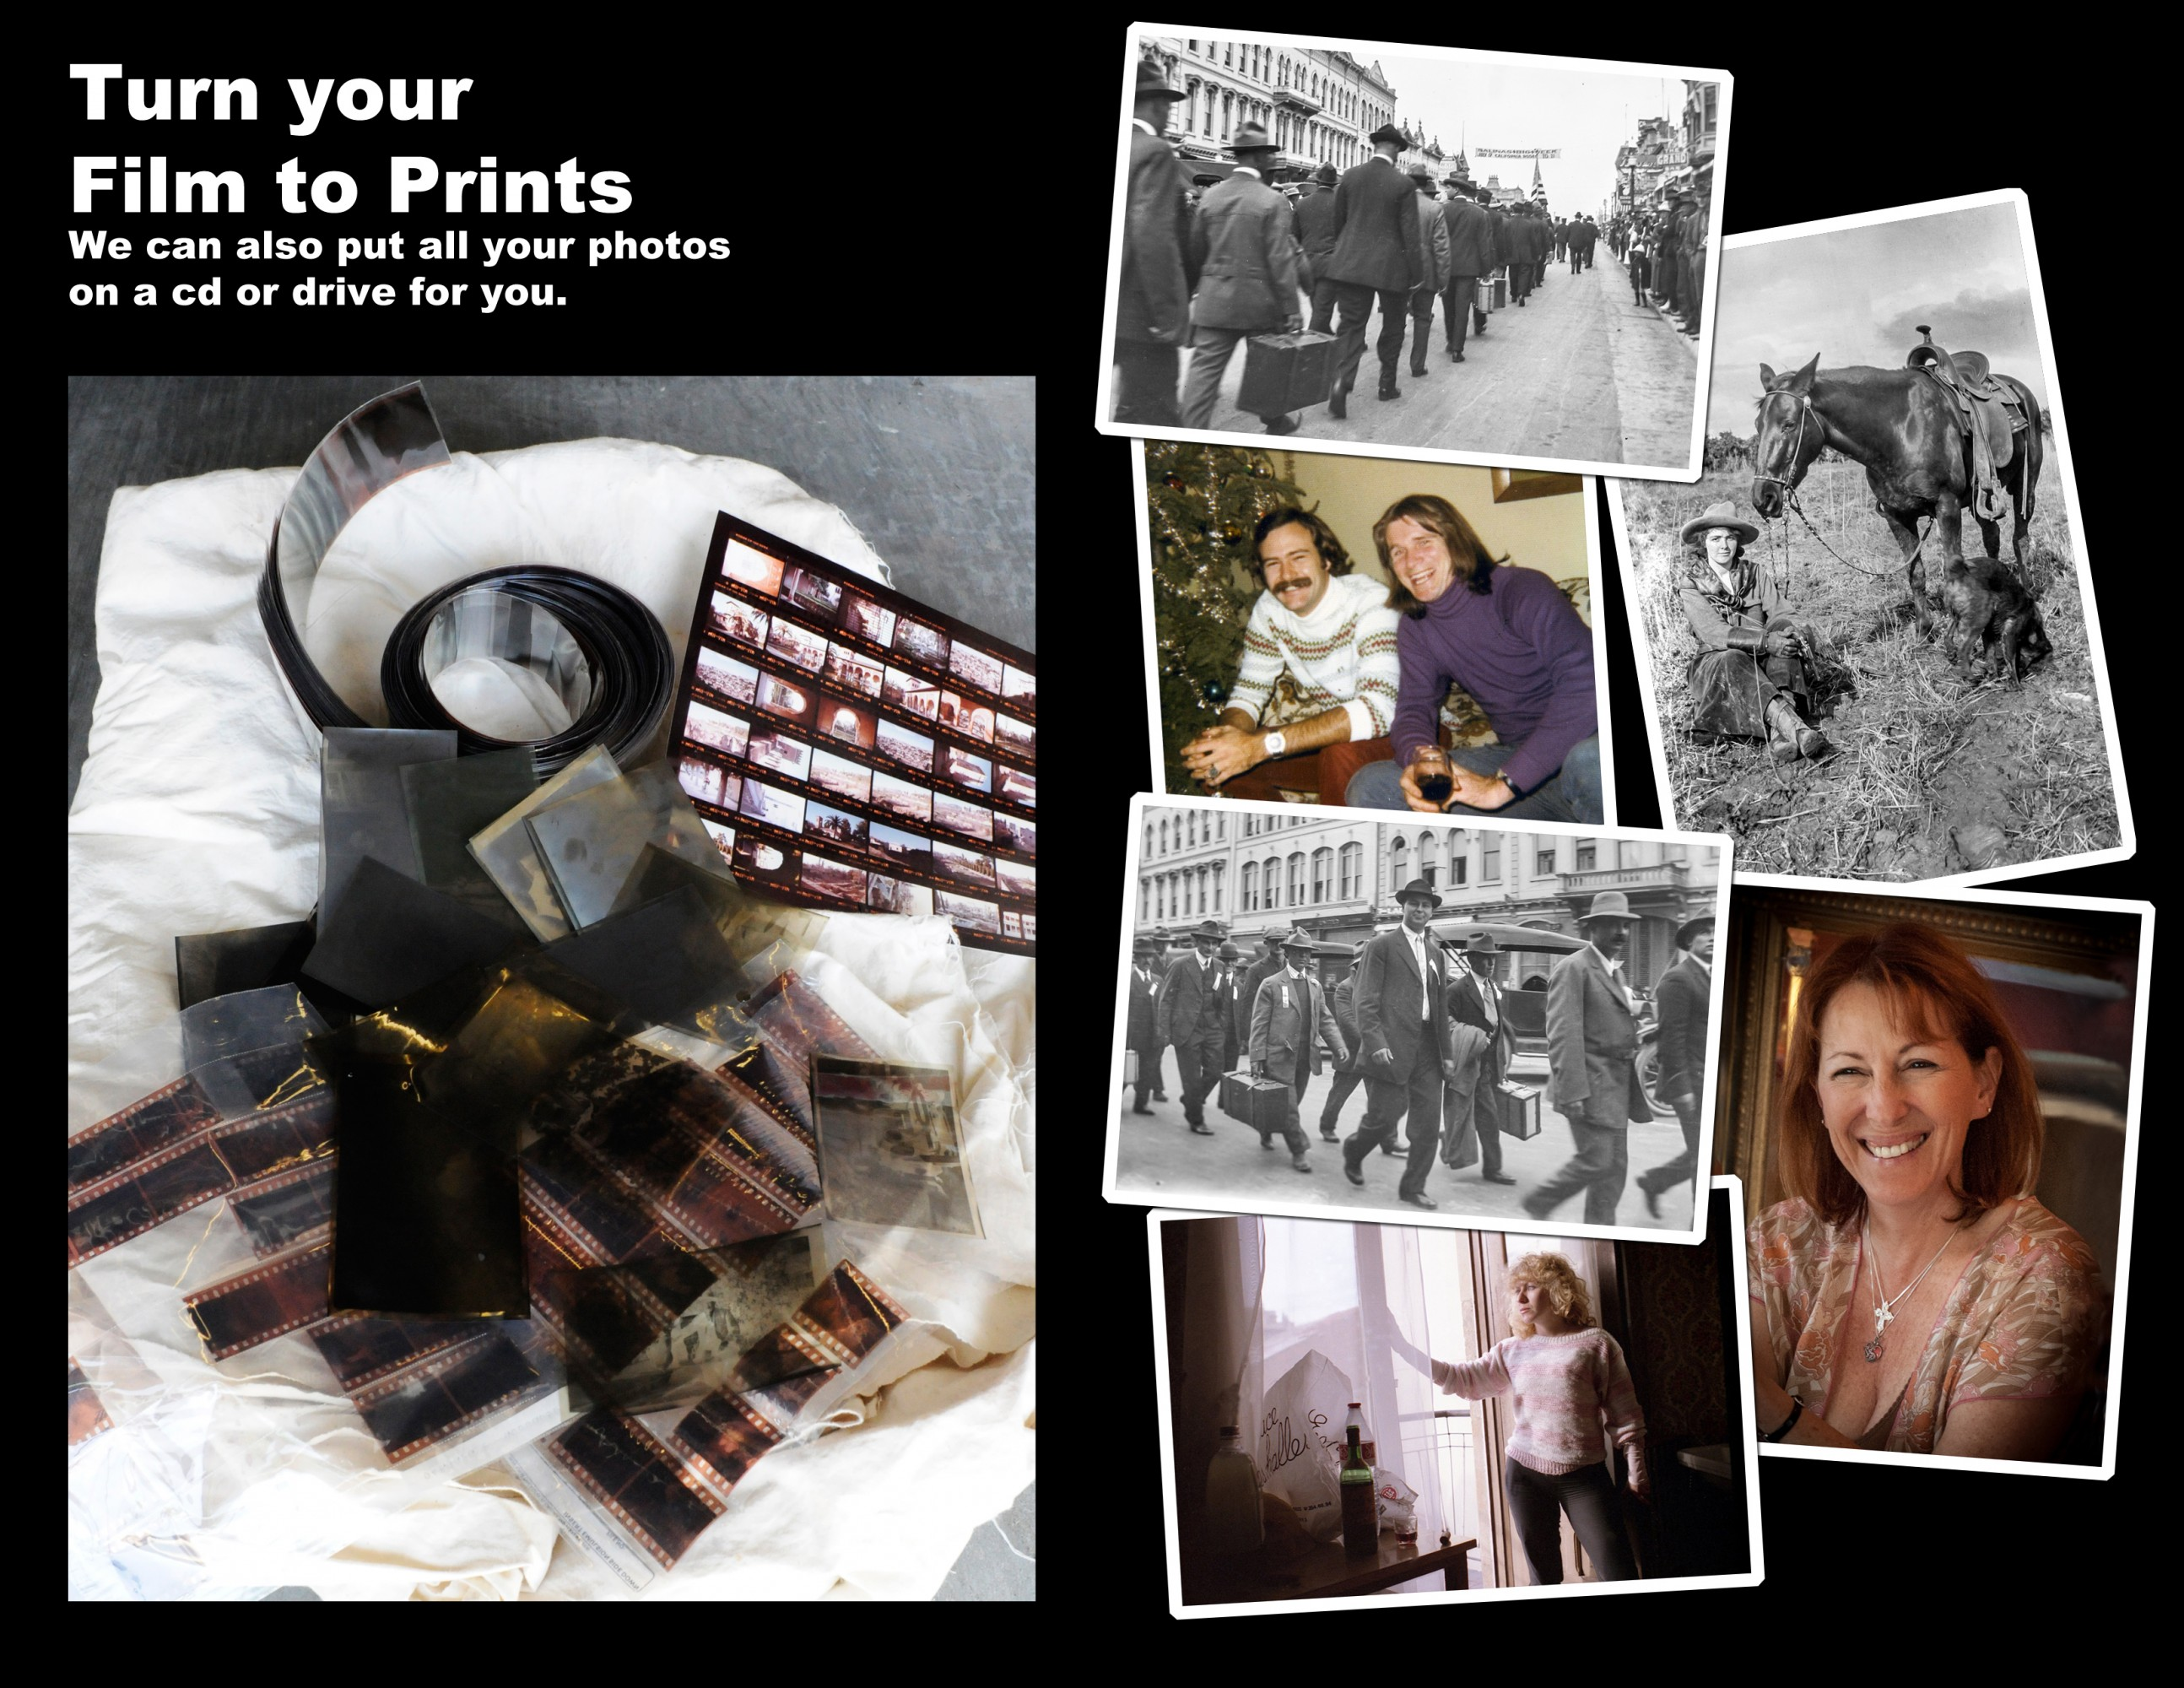 film to prints